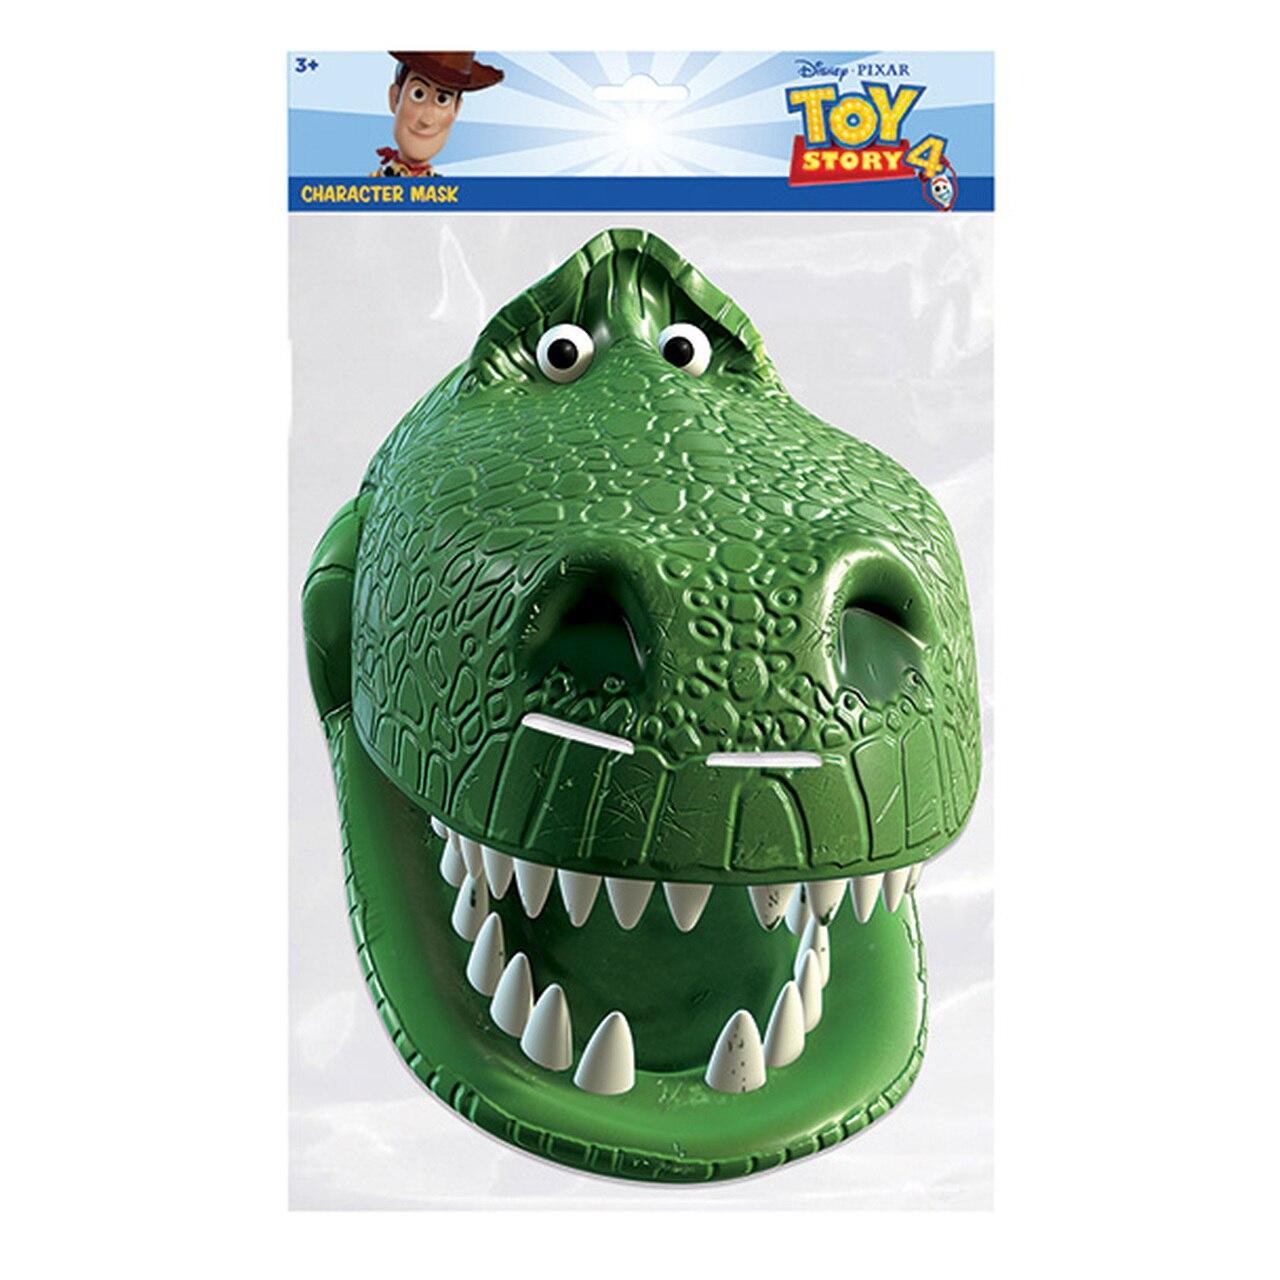 Rex Toy Story 4 Mask